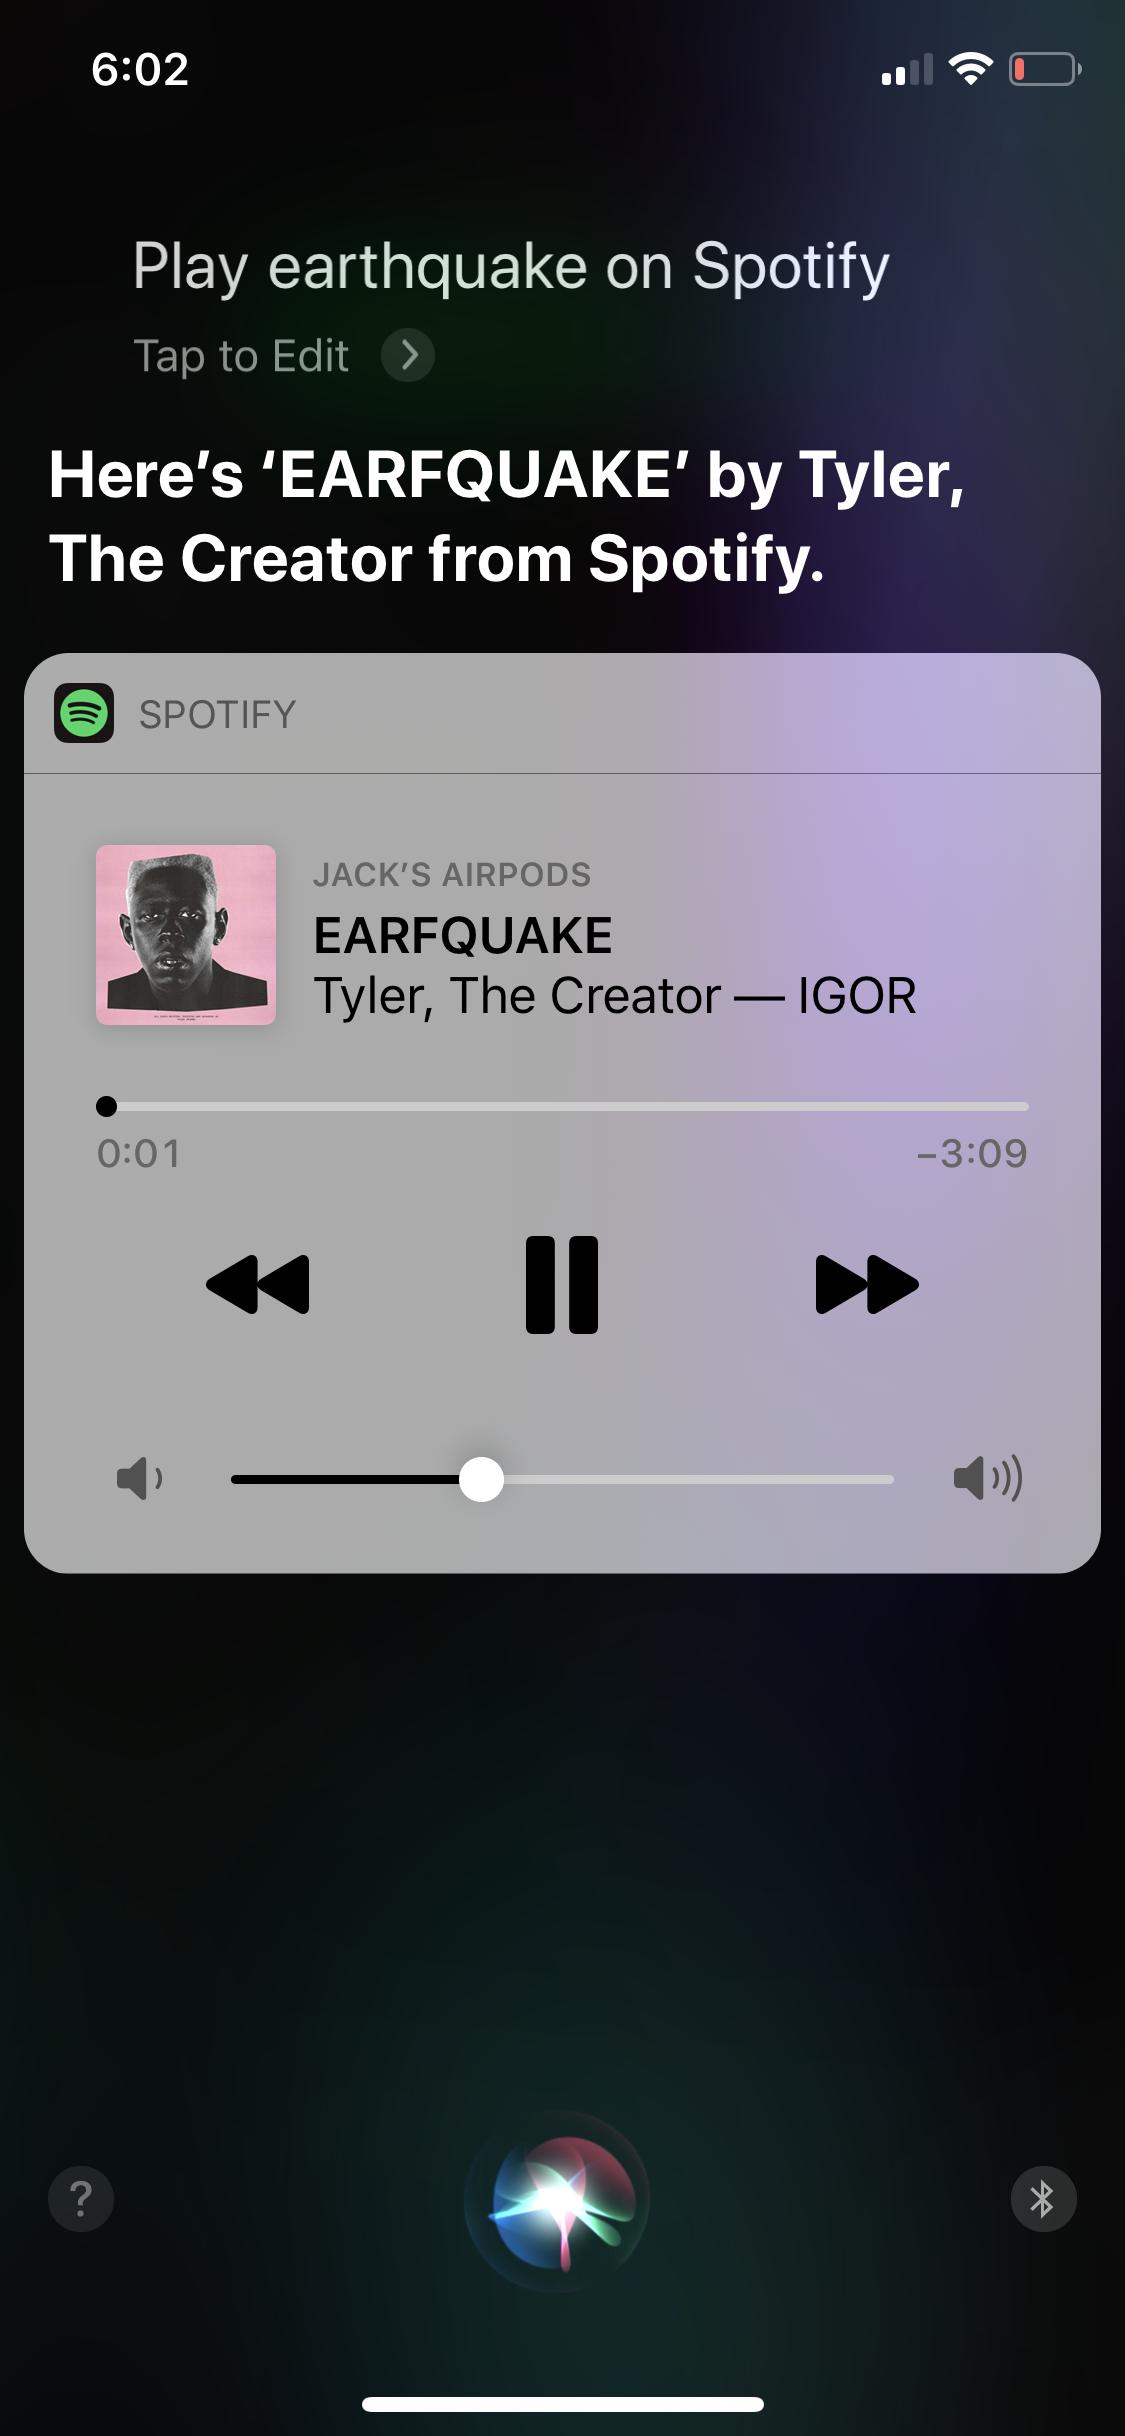 Ios Siri Shortcuts Support The Spotify Community